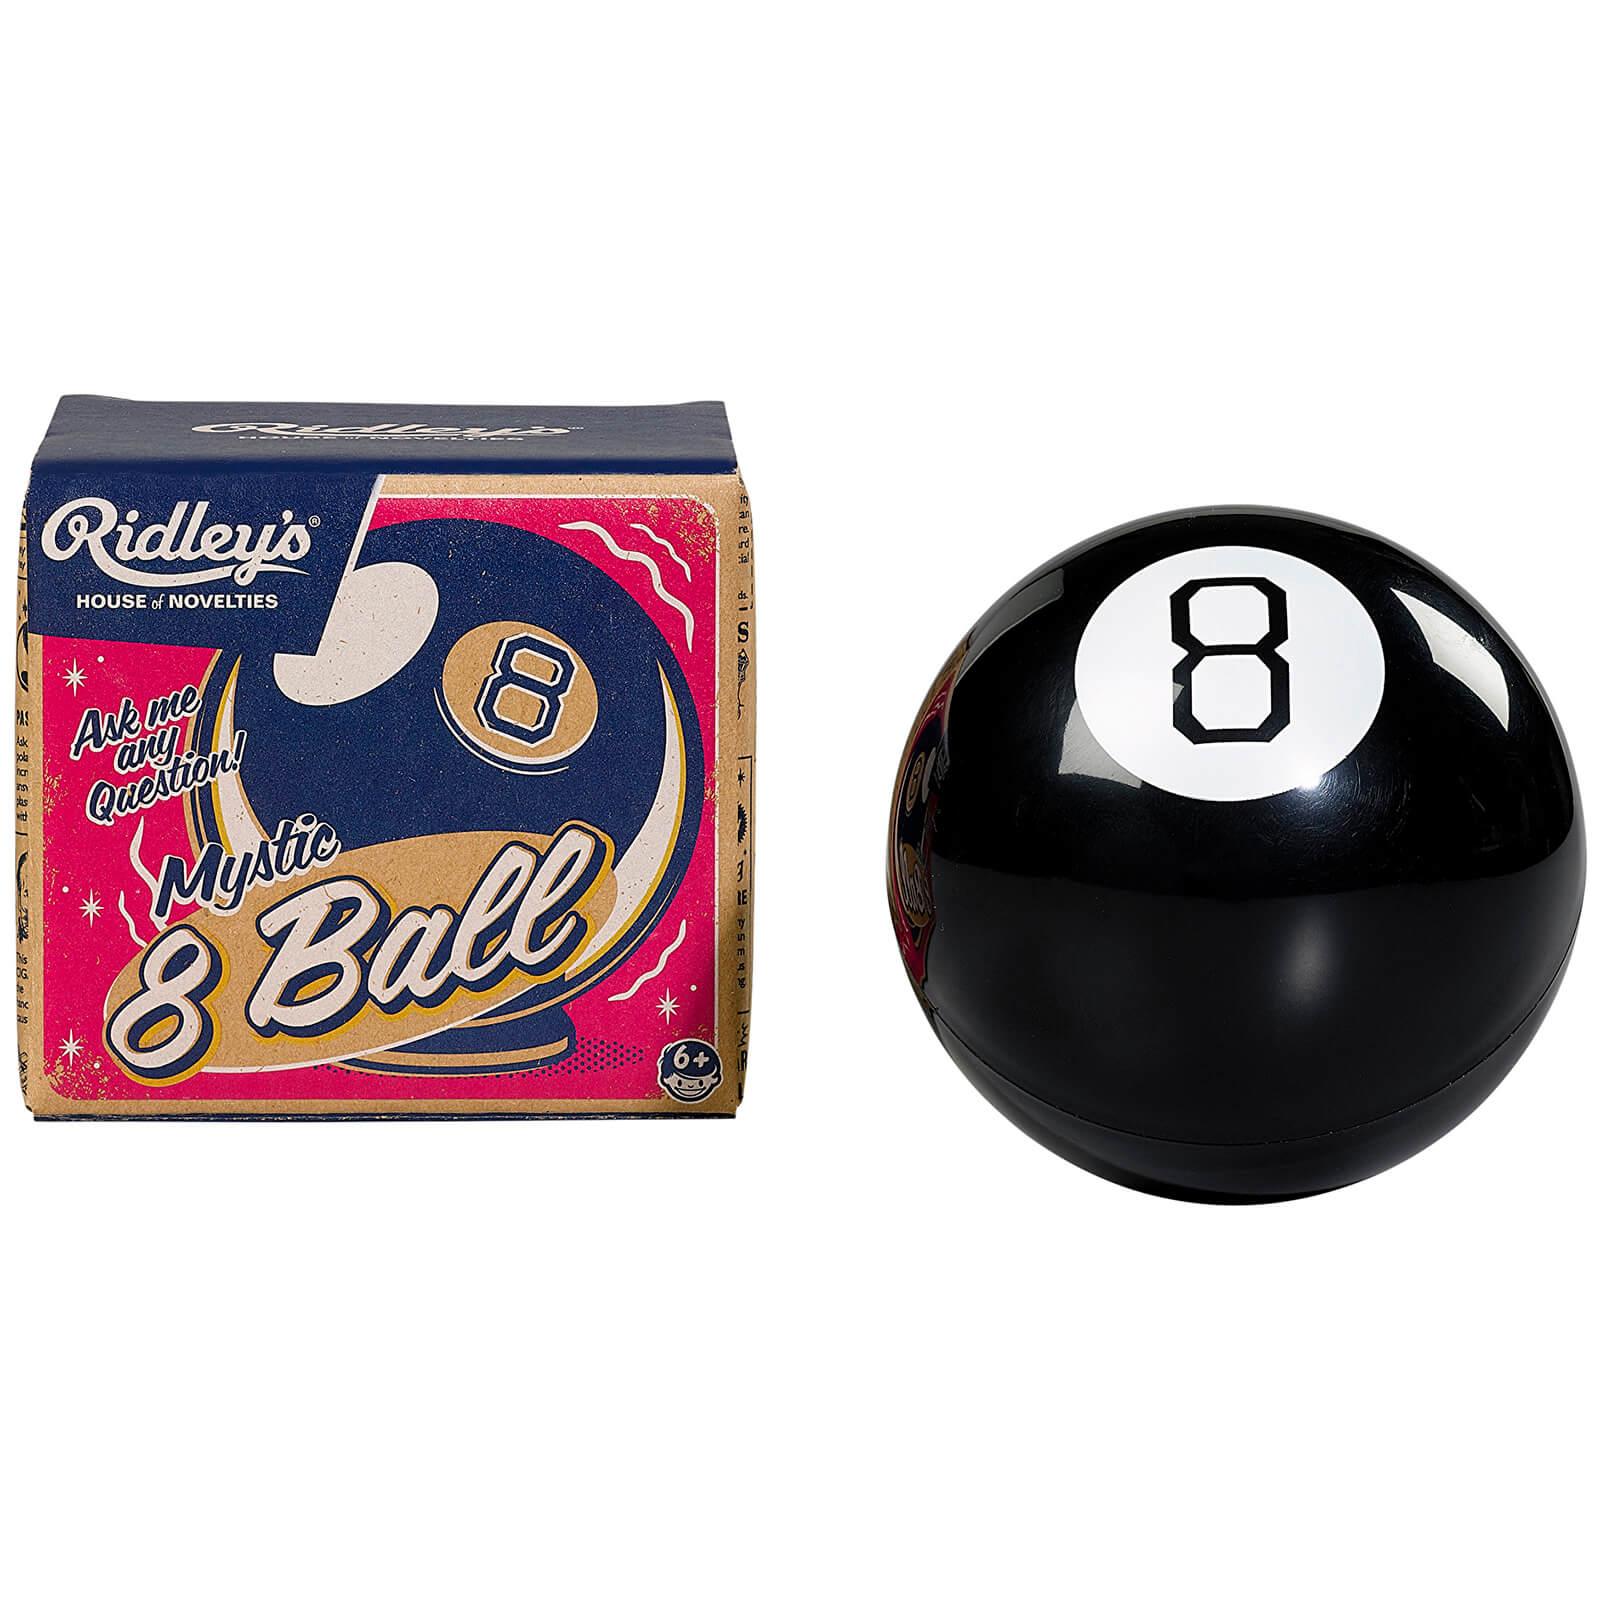 Ridleys Mystic 8 Ball Unique Gifts Zavvi Us Maybelline Volumamp039 Express The Magnum Mascara Black 6 Pcs Description